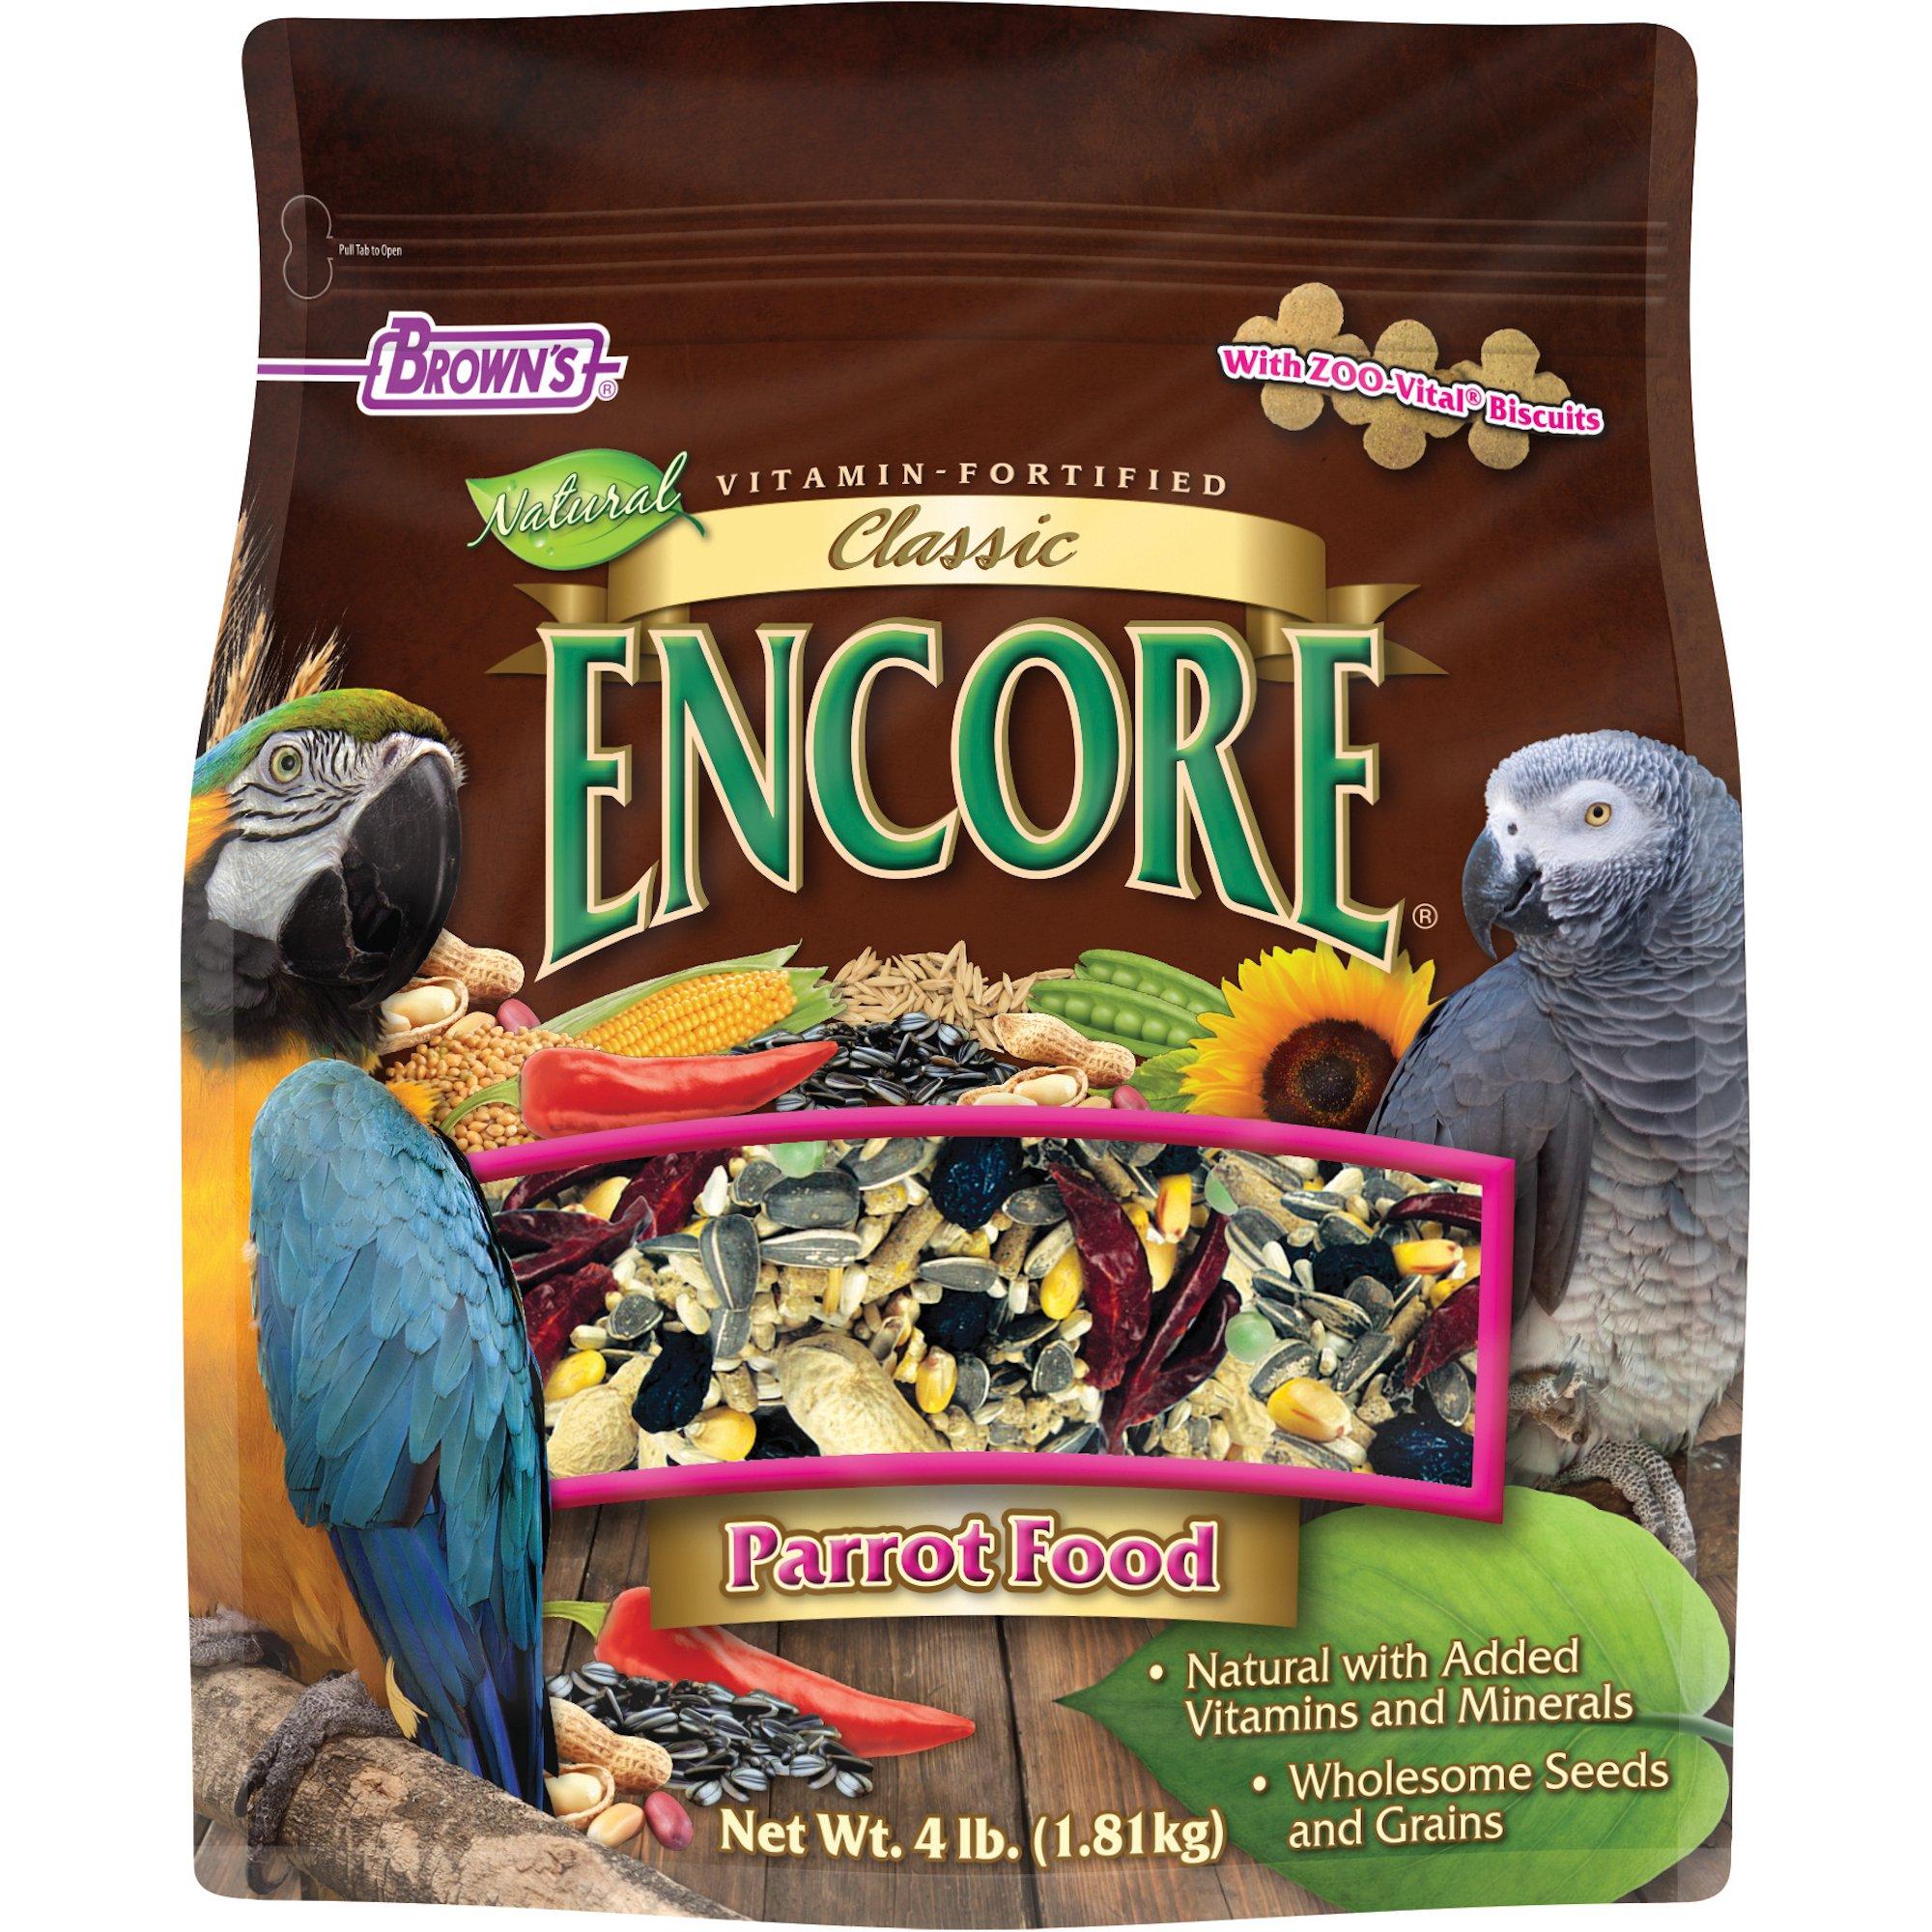 Brown's Encore Classic Parrot Food